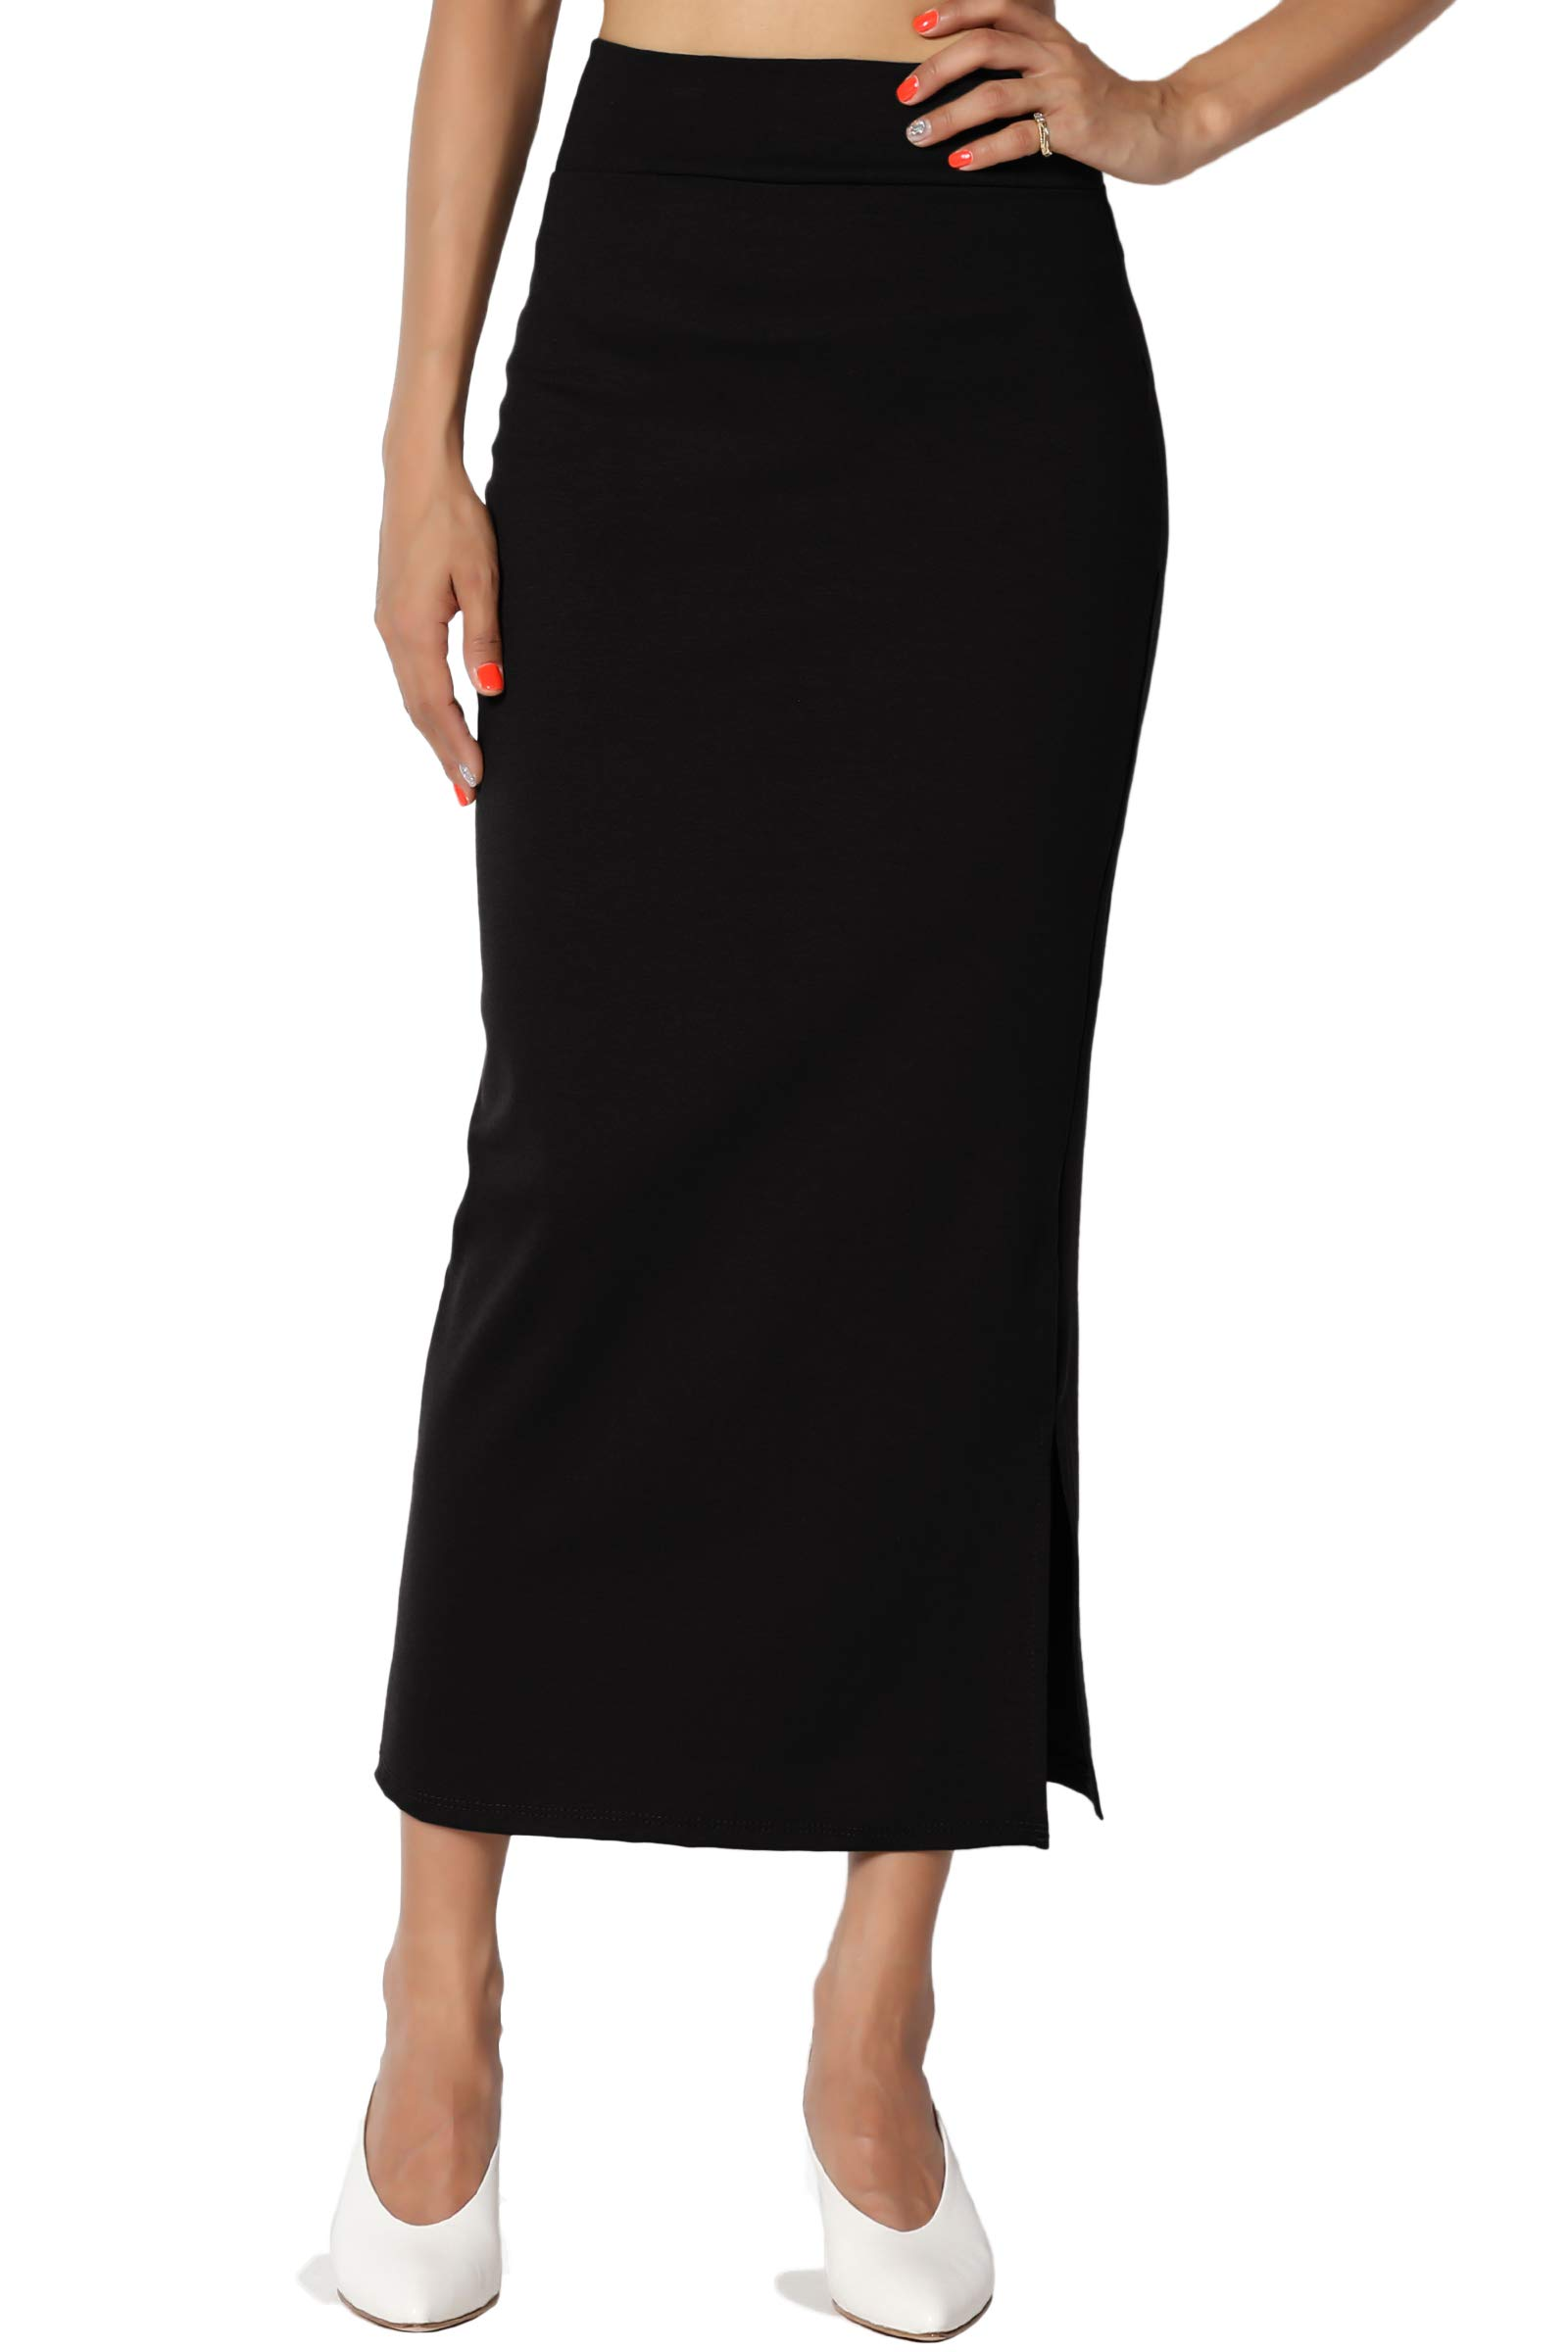 TheMogan Women's Side Slit Ponte Knit High Waist Mid-Calf Pencil Skirt Black L